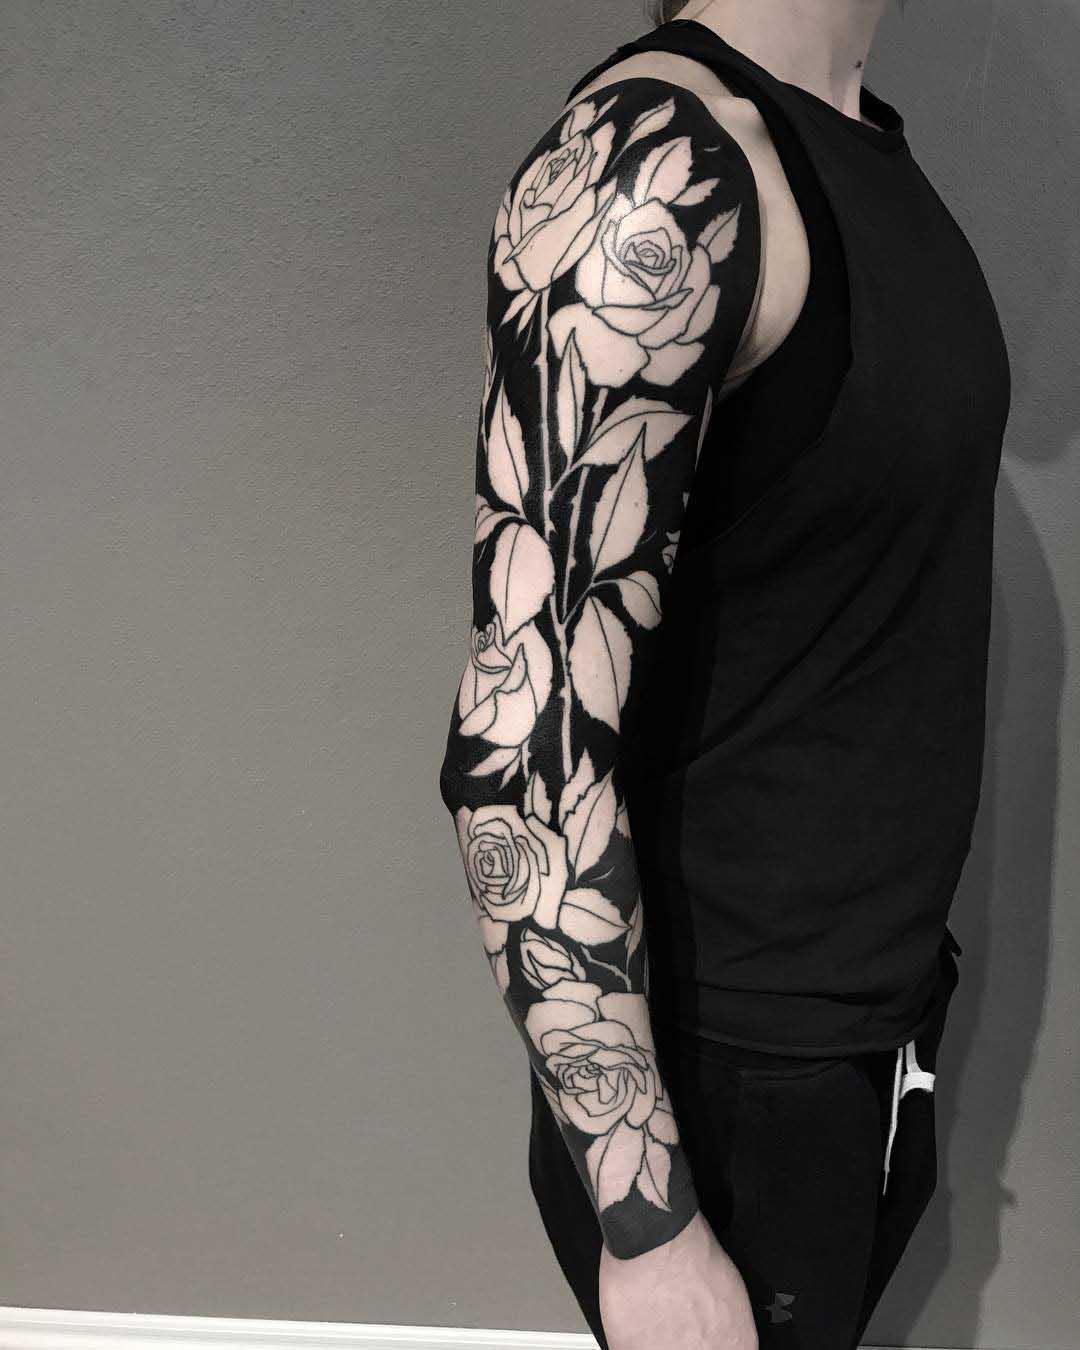 tattoo sleeve blackwork style and roses